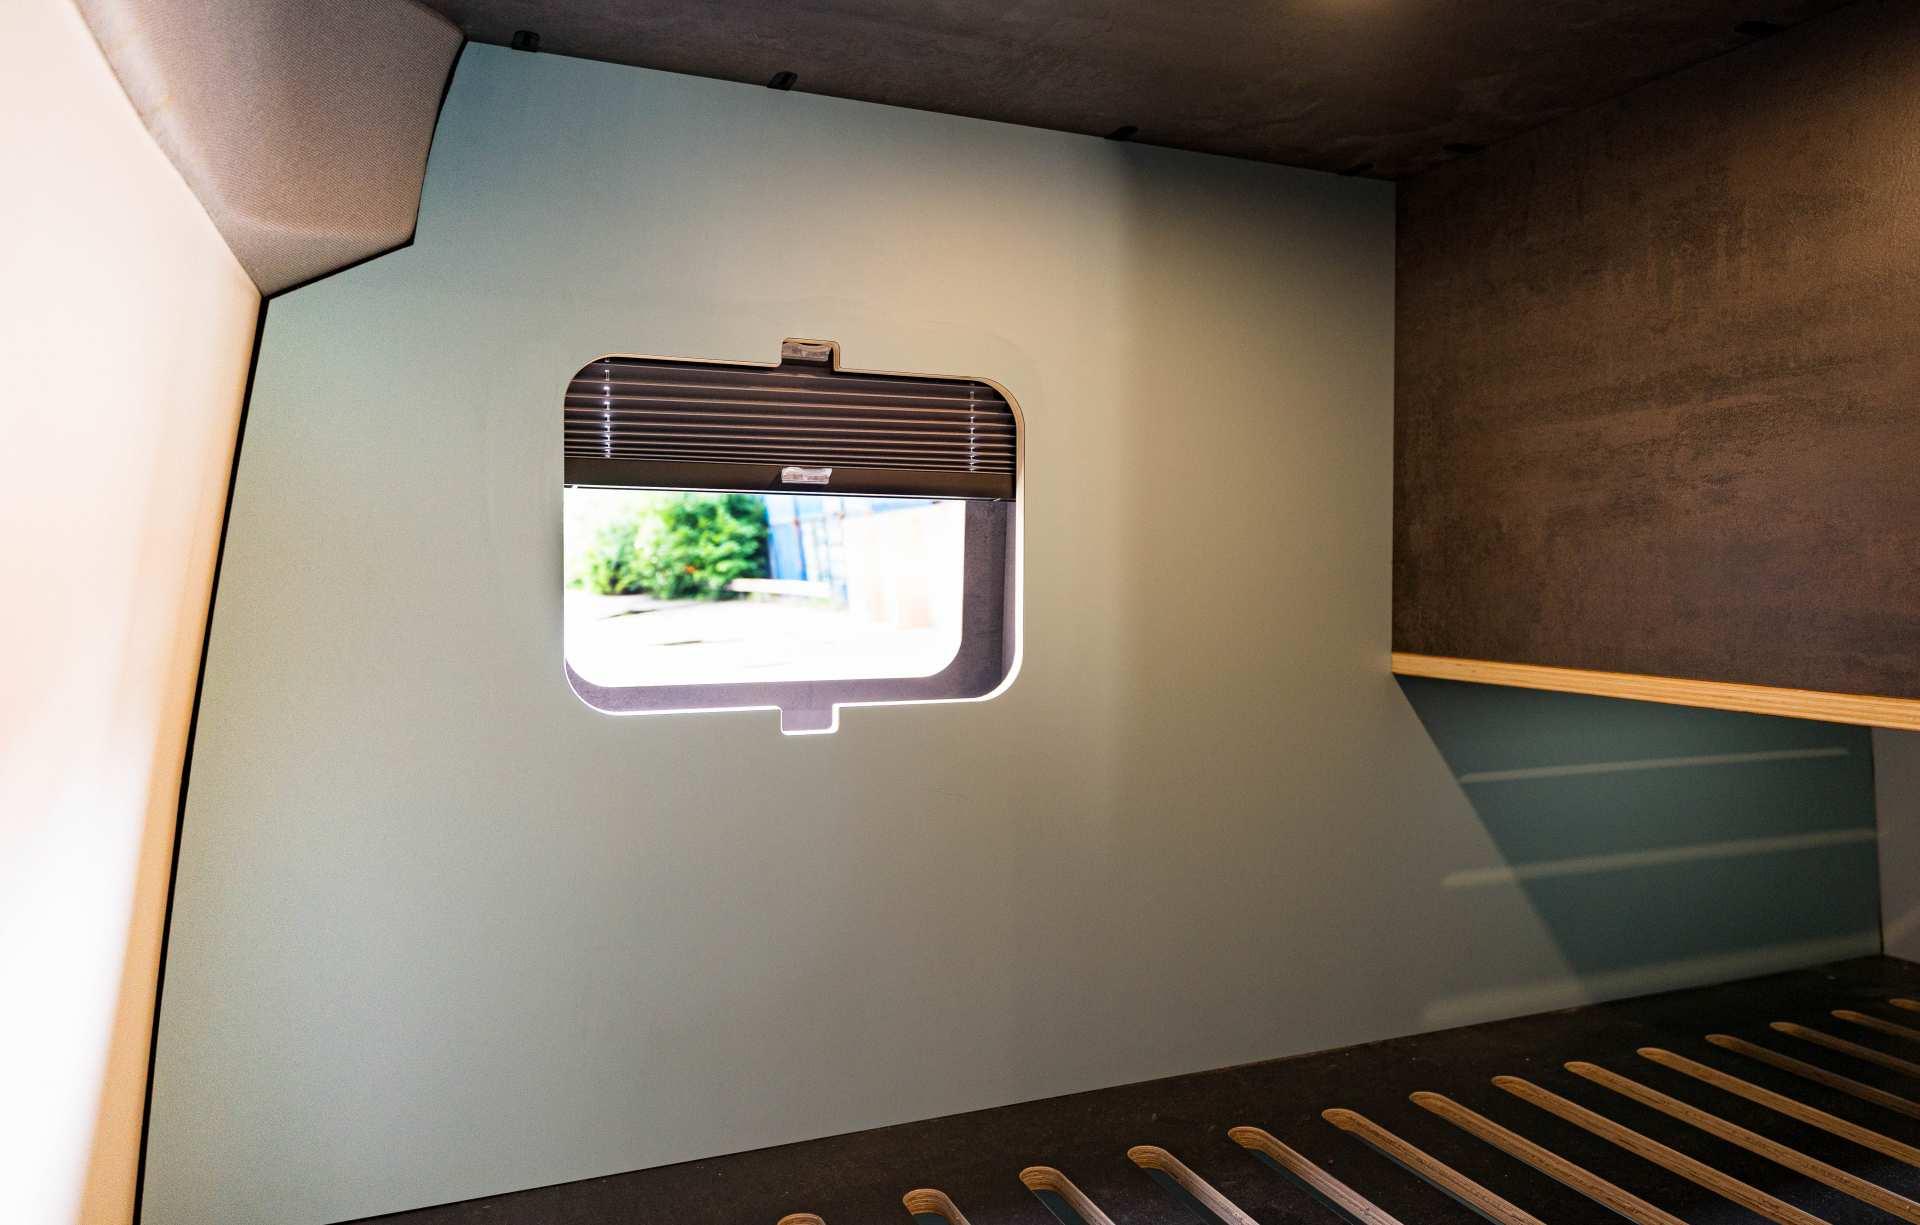 Individualausbau: Full House VW Crafter - 16